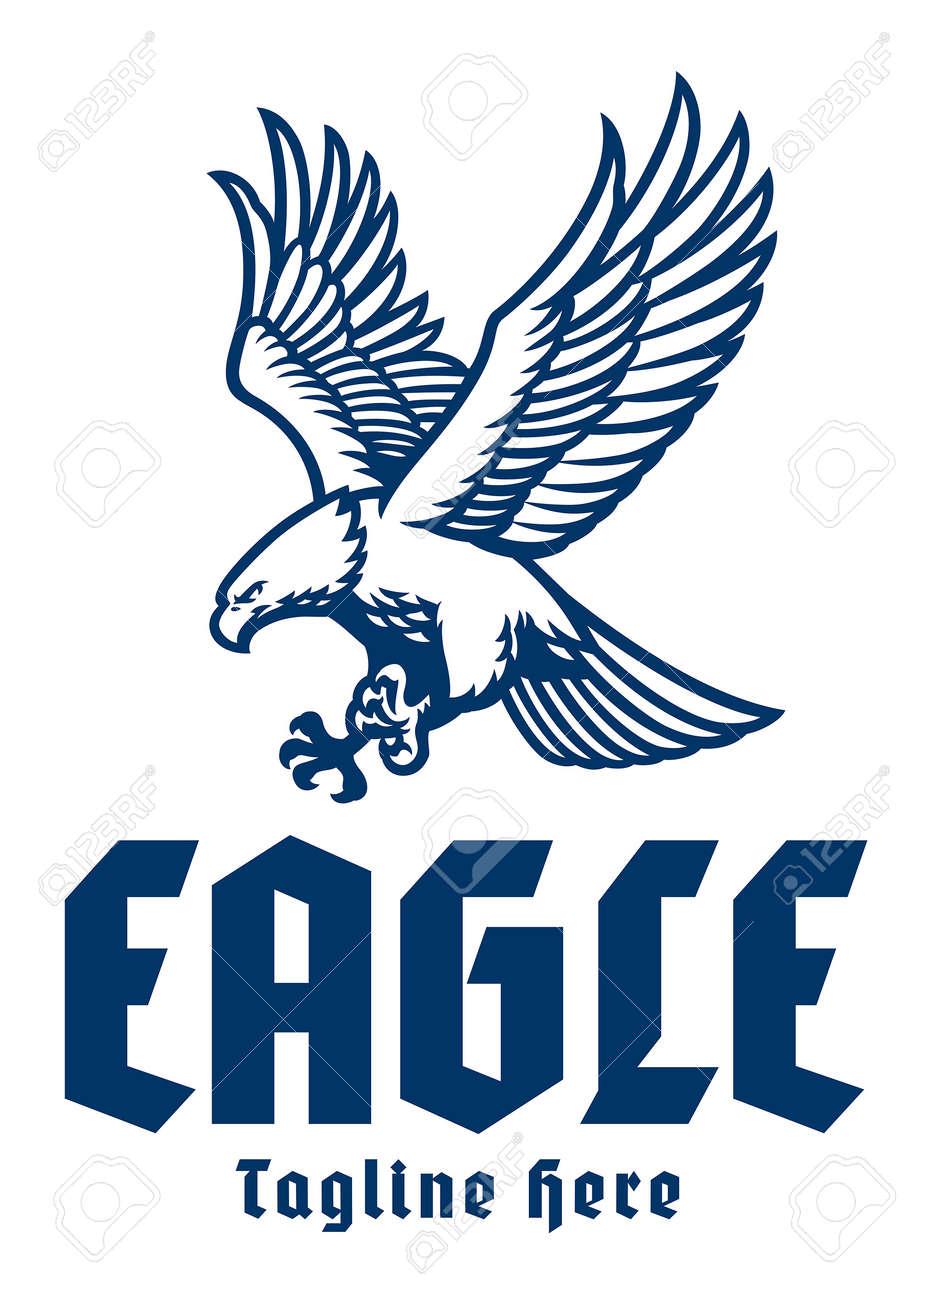 flying eagle mascot logo - 171104017